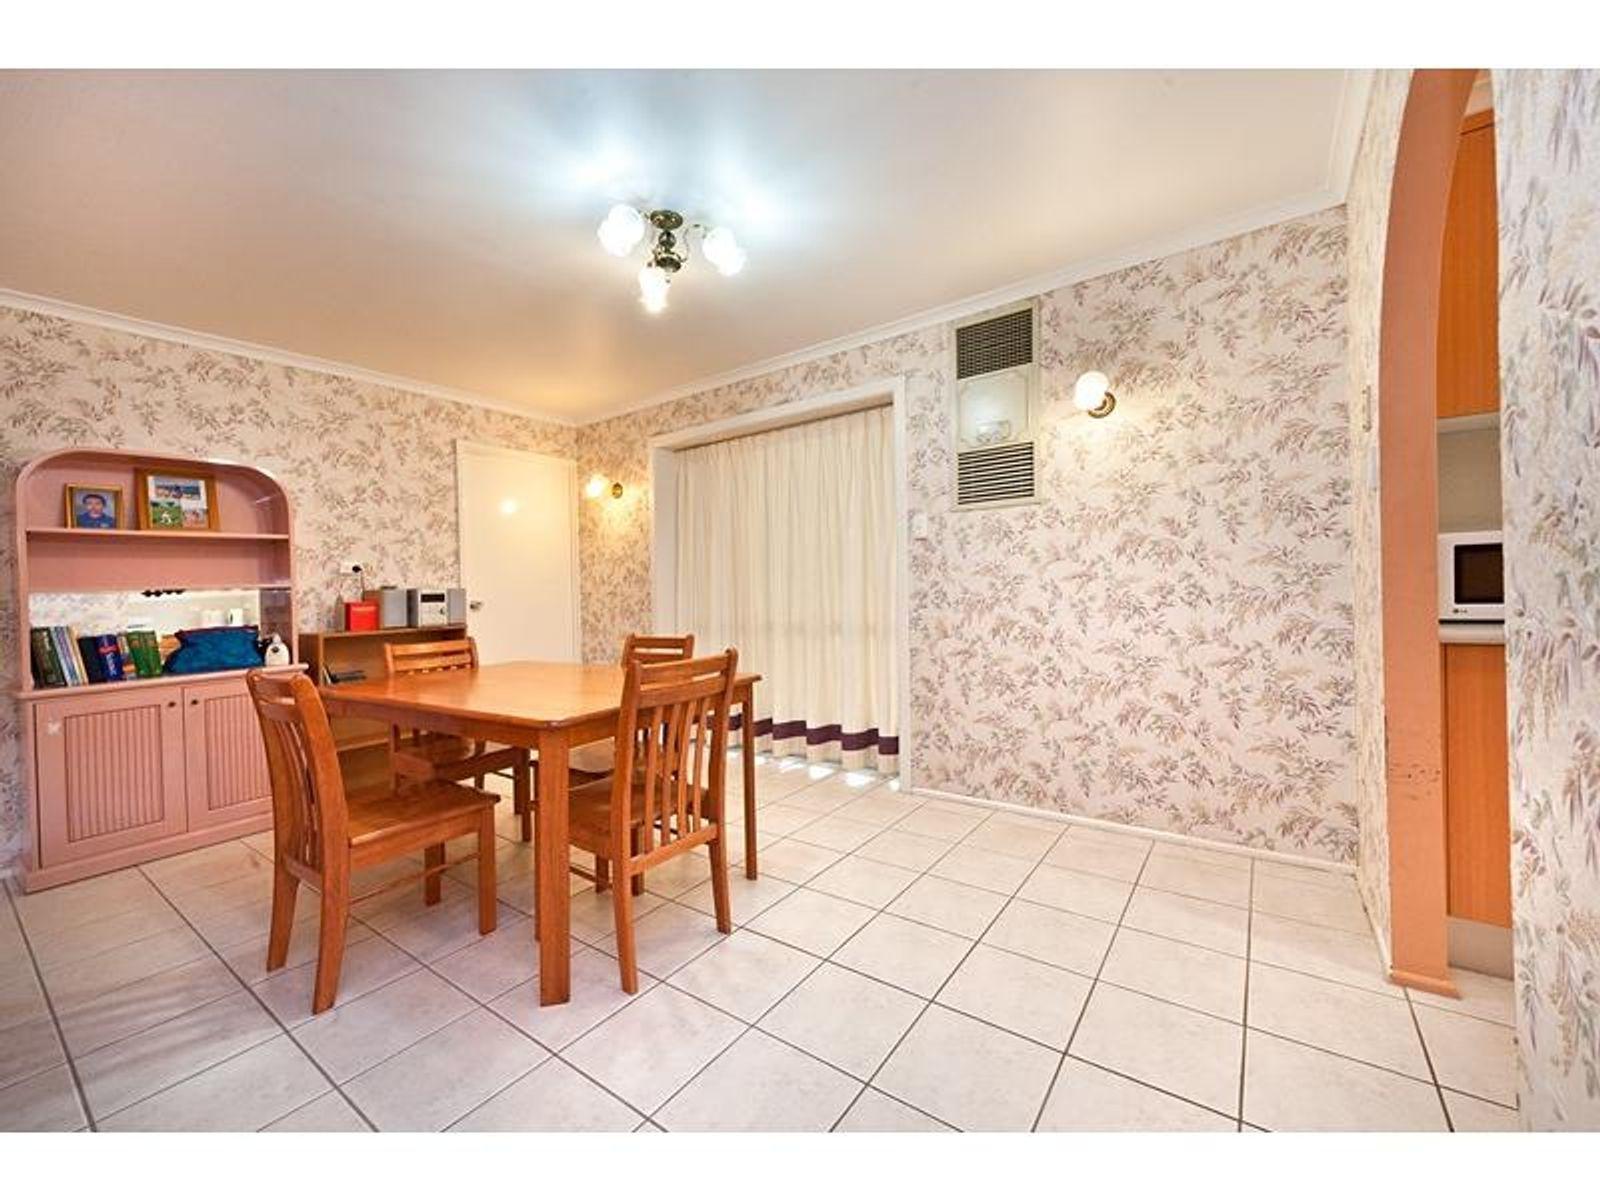 457 Geordie Street, Frenchville, QLD 4701